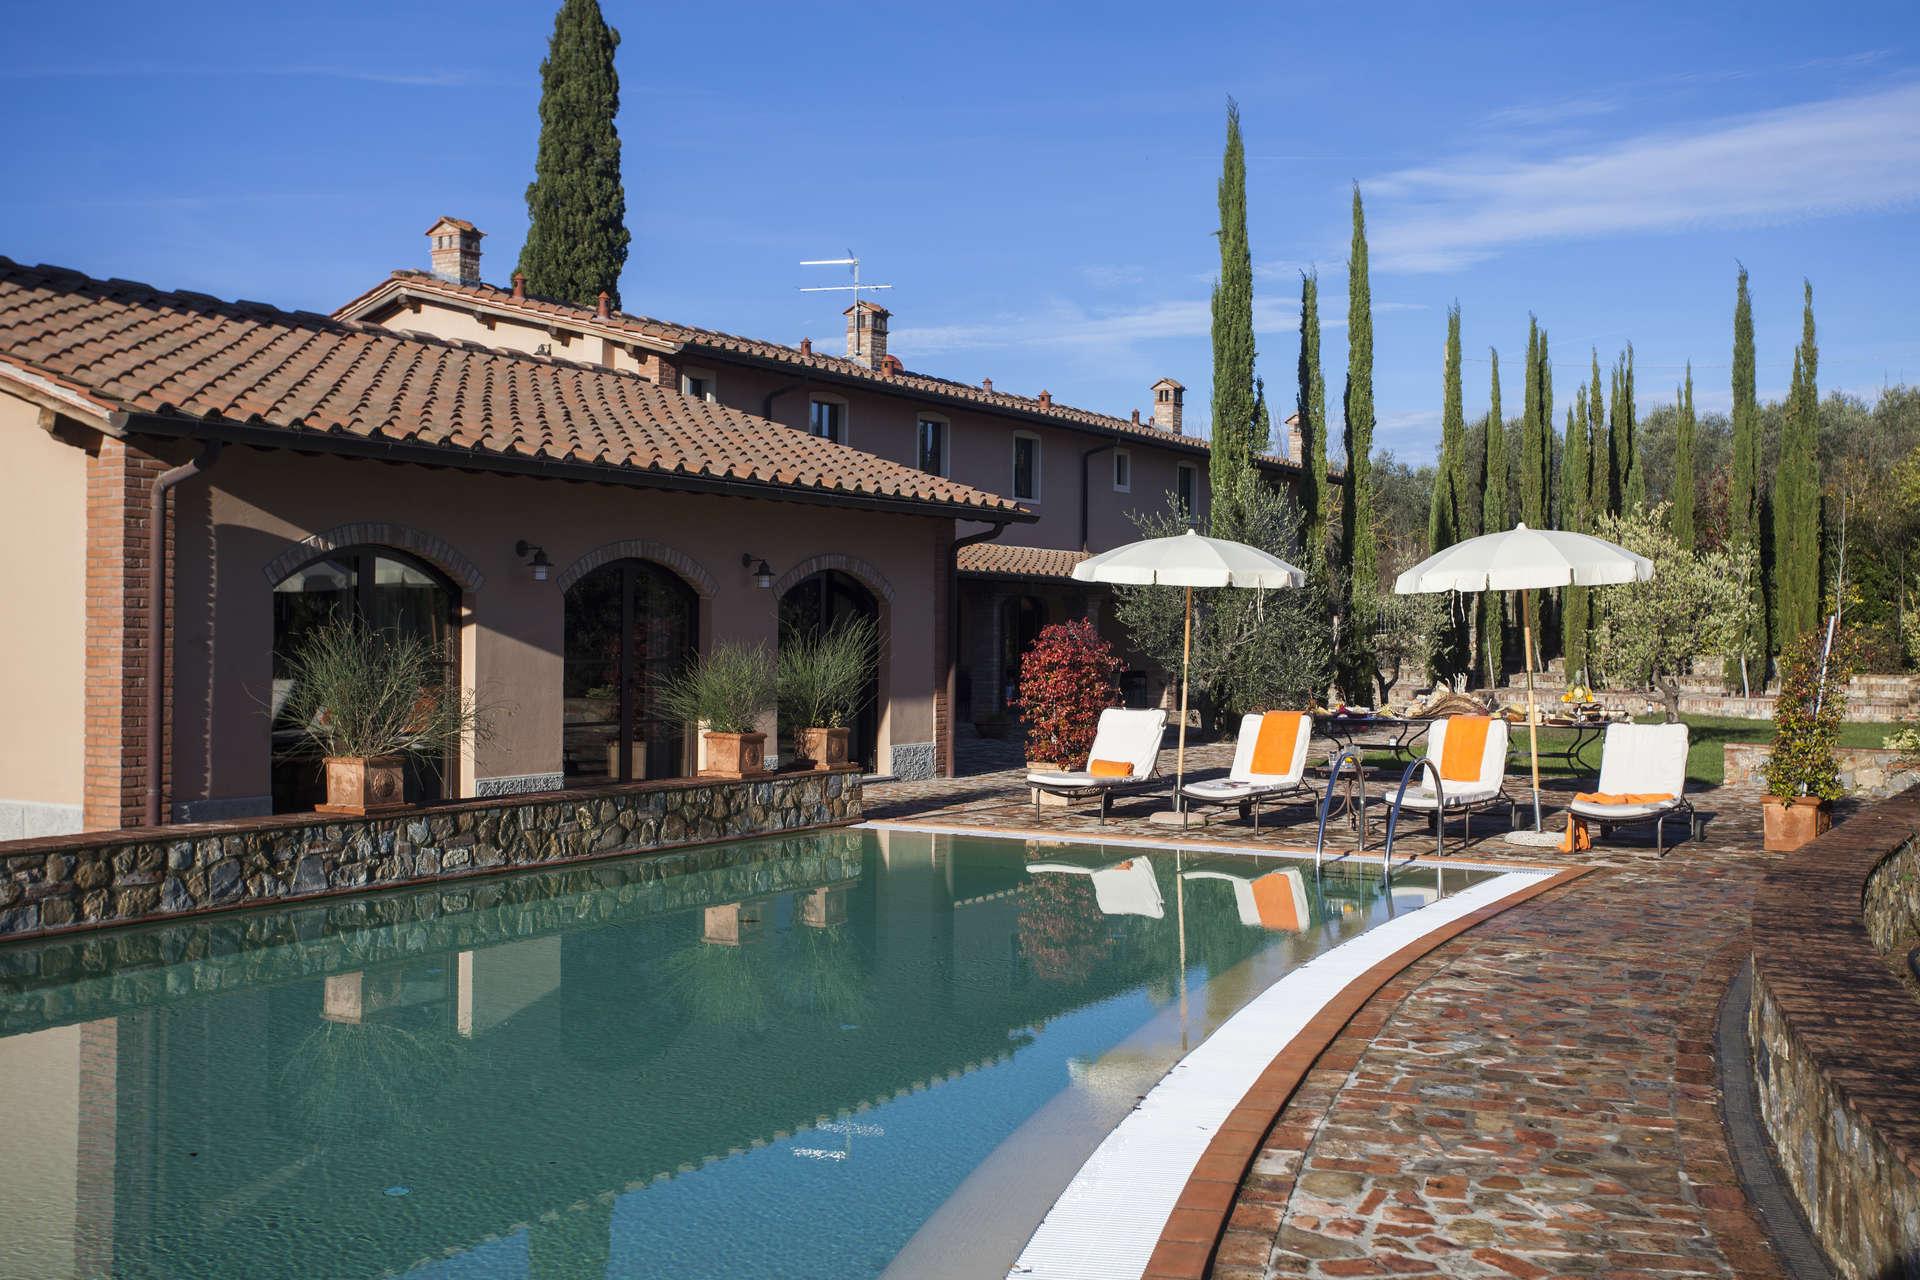 Luxury vacation rentals europe - Italy - Tuscany - Chia nti - Etrusca - Image 1/13